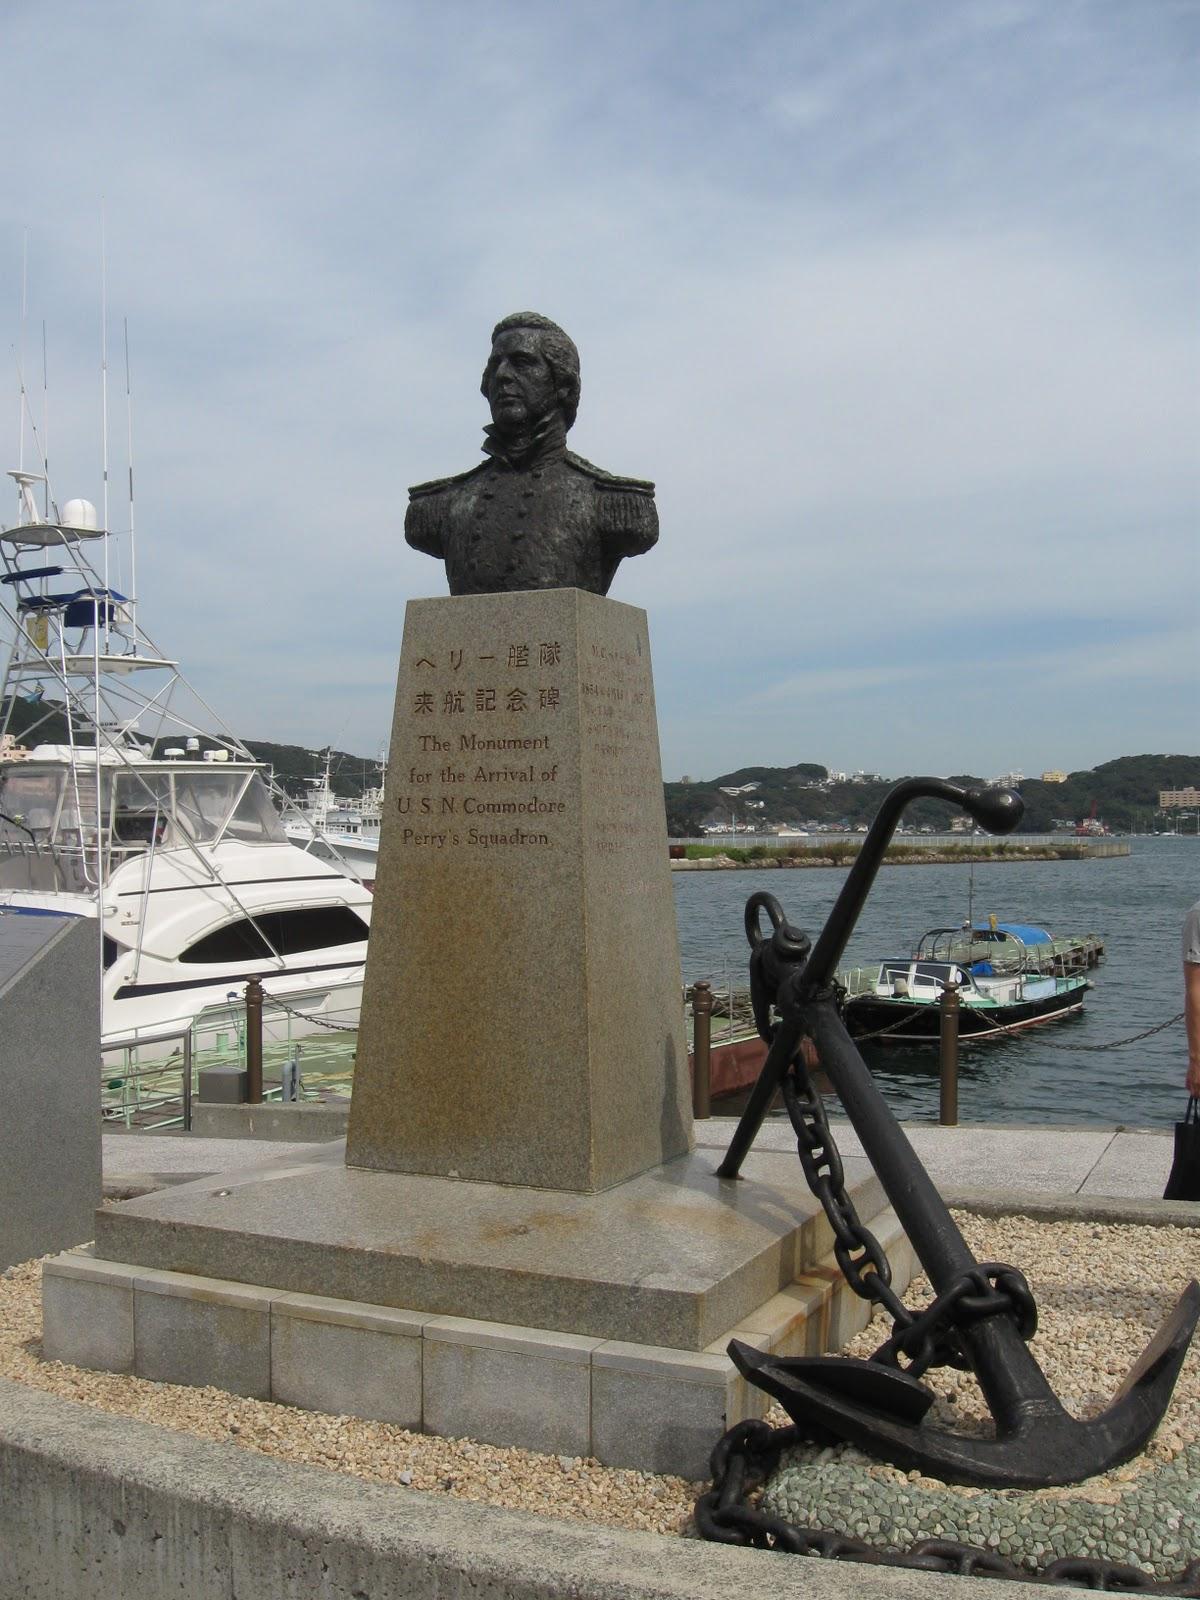 Bust of Commodore Matthew Perry, Shimoda, Shizuoka Prefecture, Japan. Photo taken on September 24, 2011.